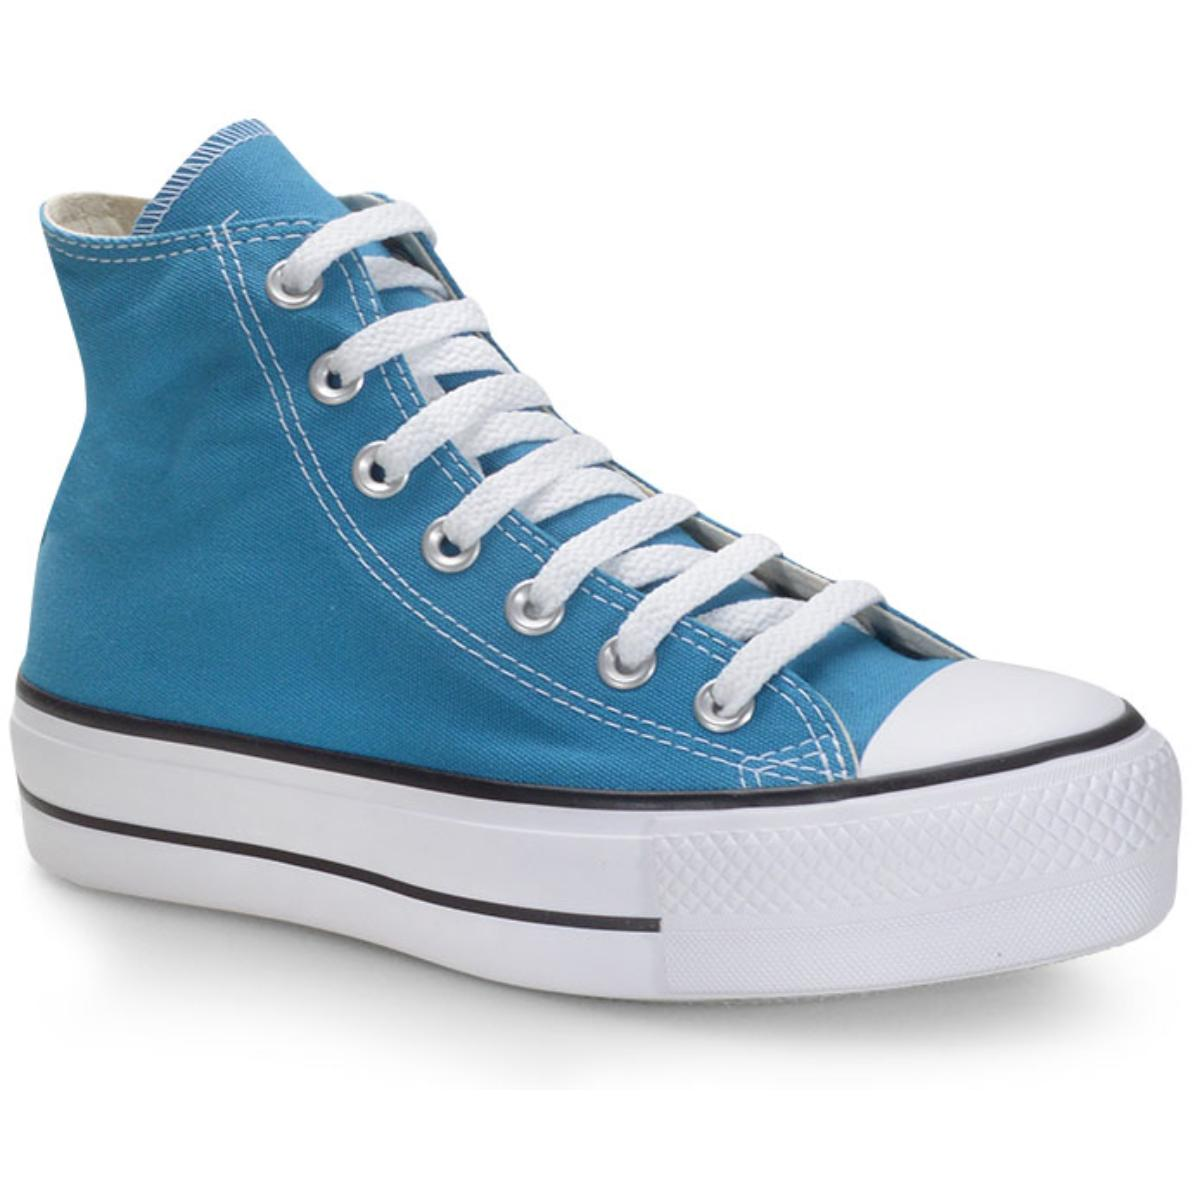 Tênis Unisex All Star Ct012000016 Azul Acido/preto/branco